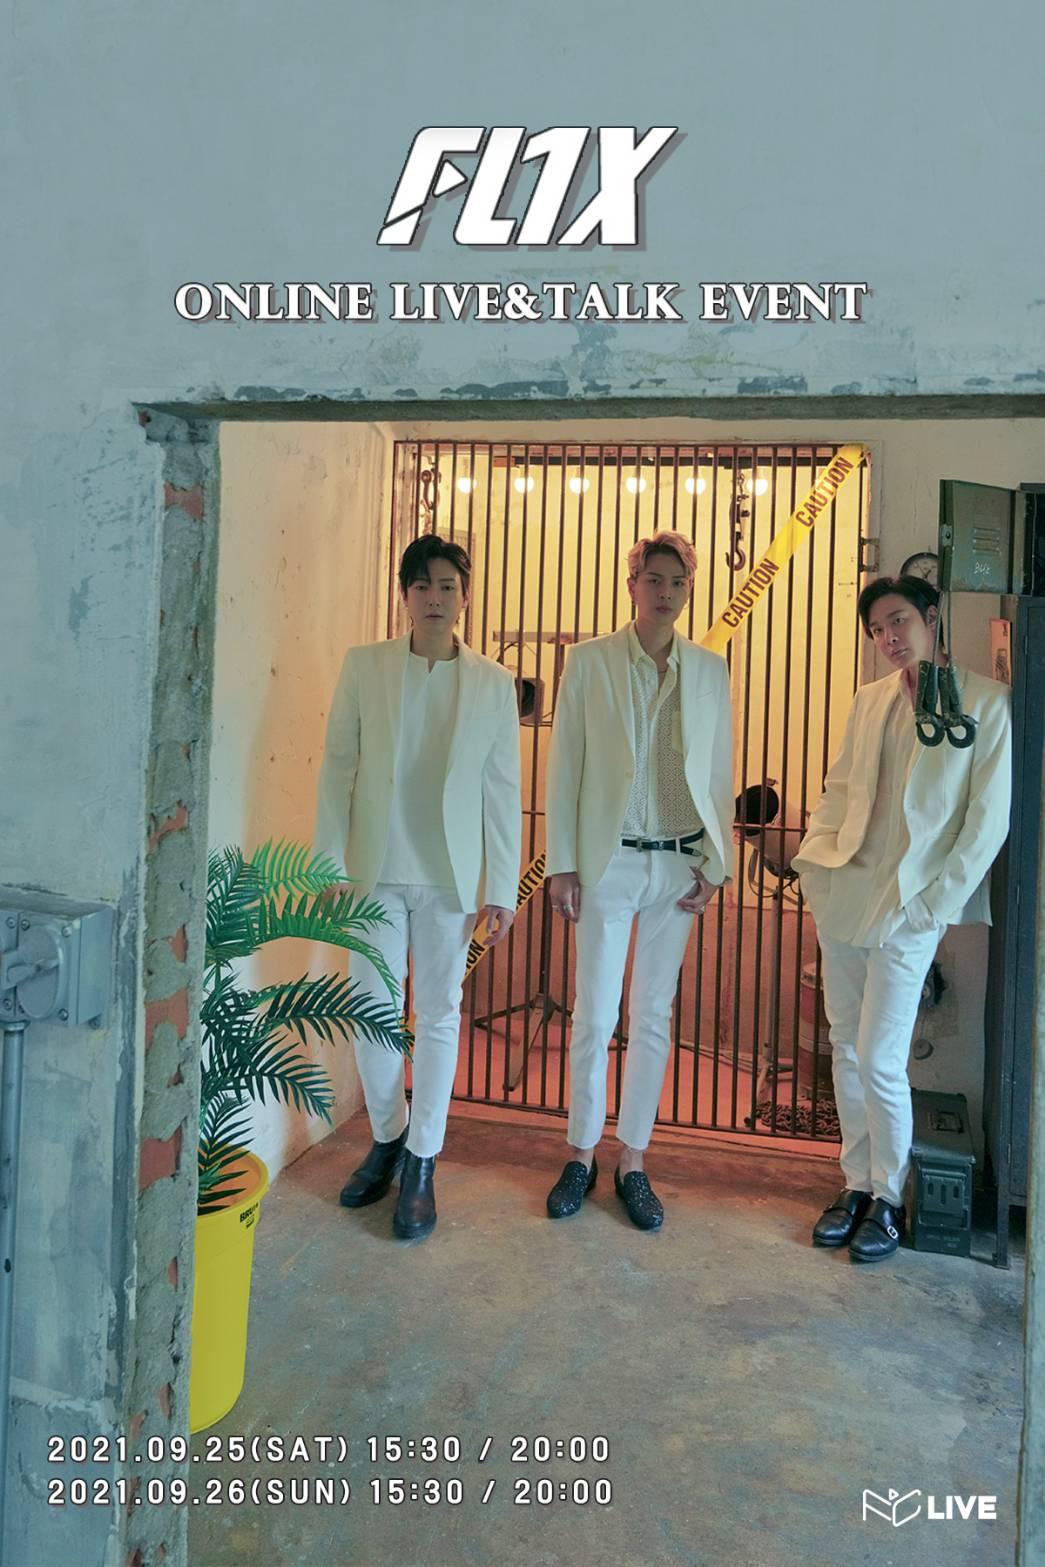 FL1X ONLINE LIVE & TALK EVENT [show2]